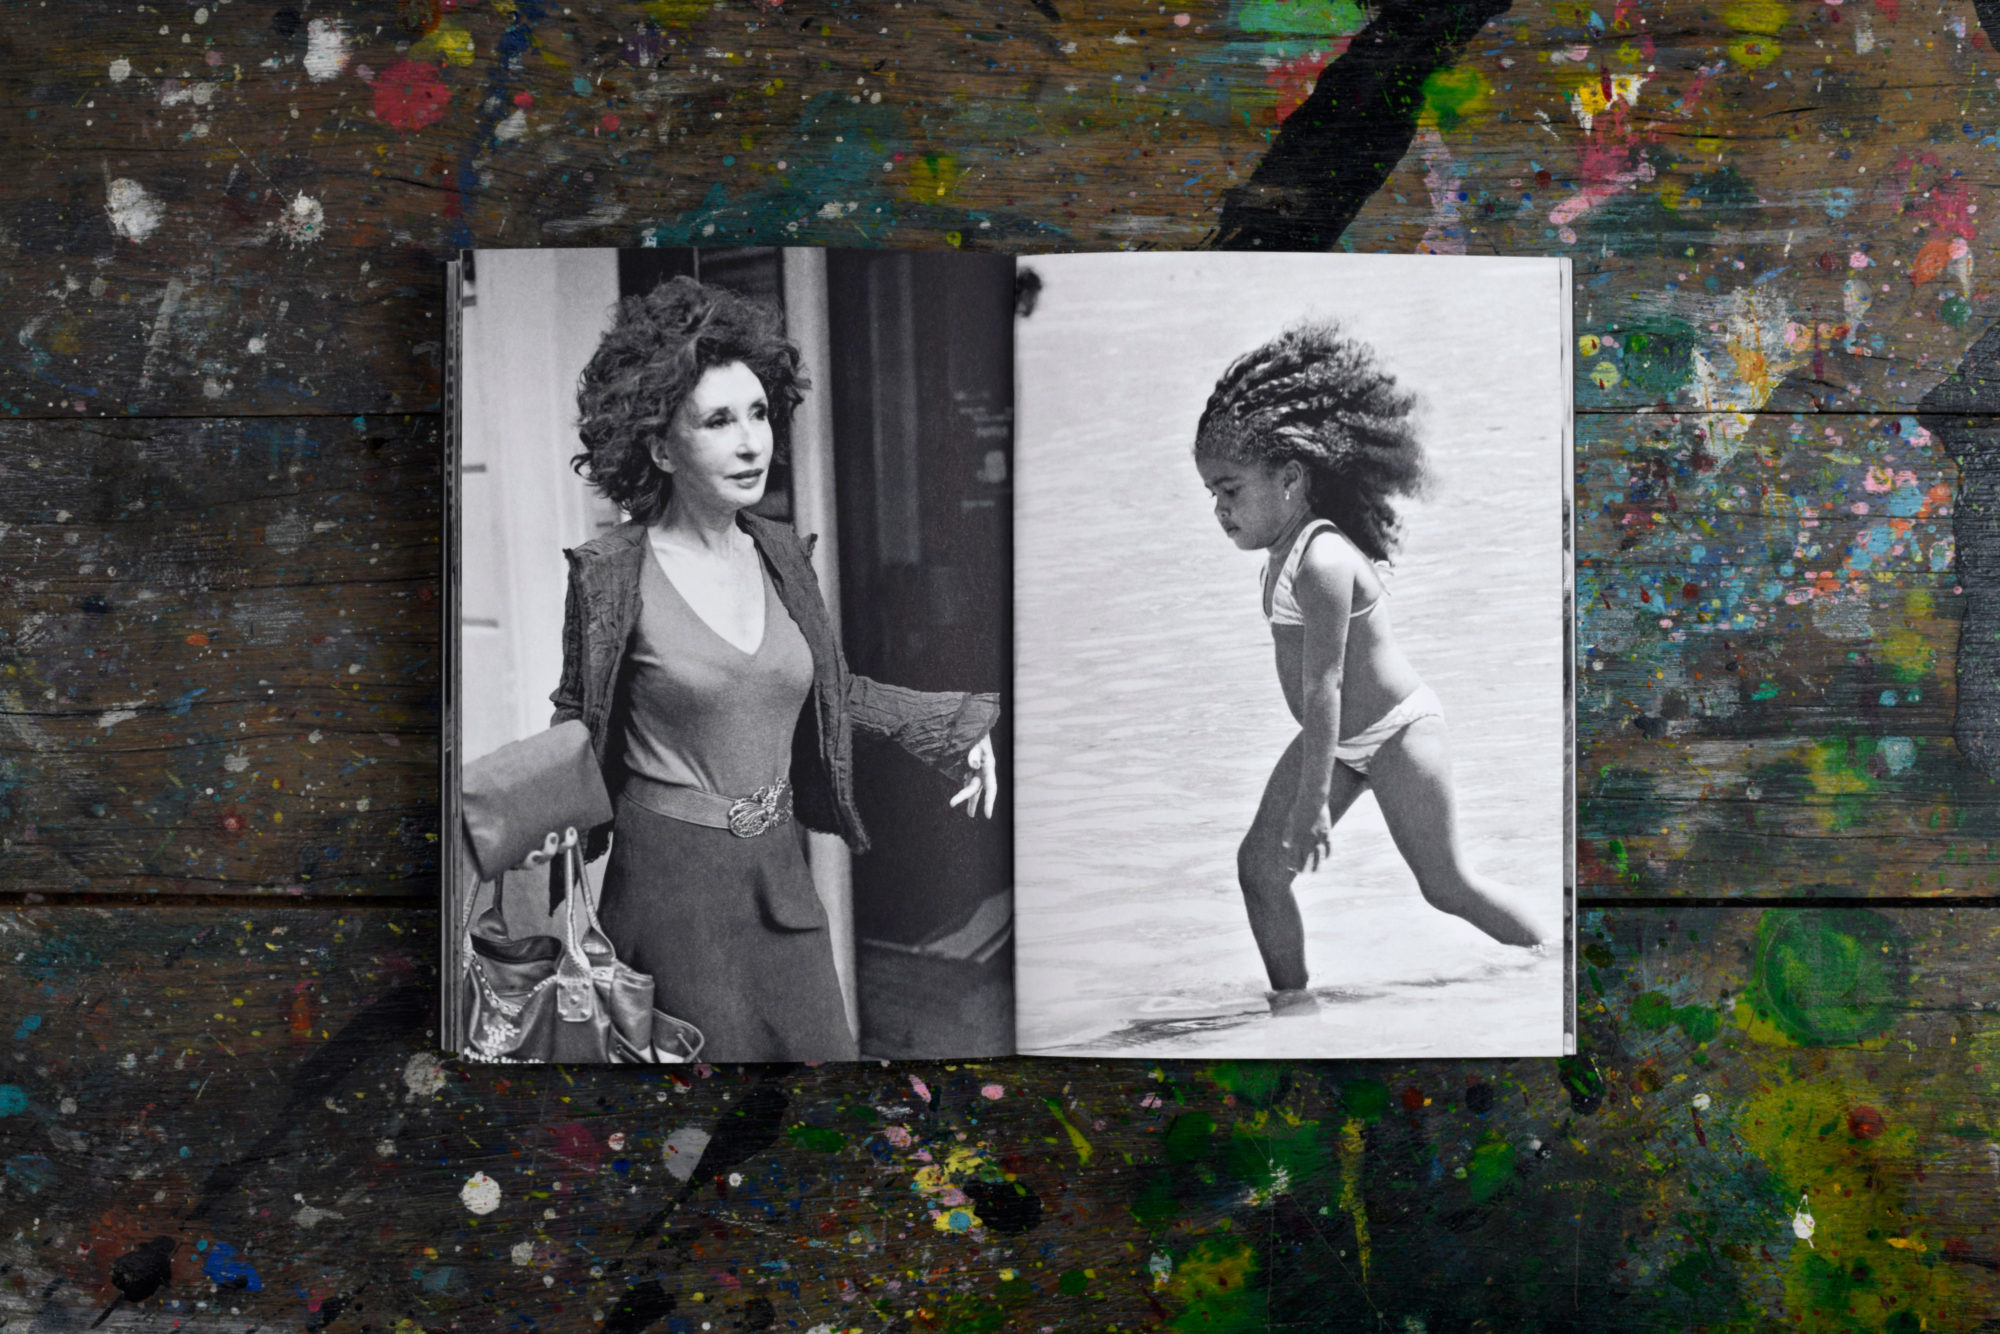 Never Stop Dancing - François-Marie Banier